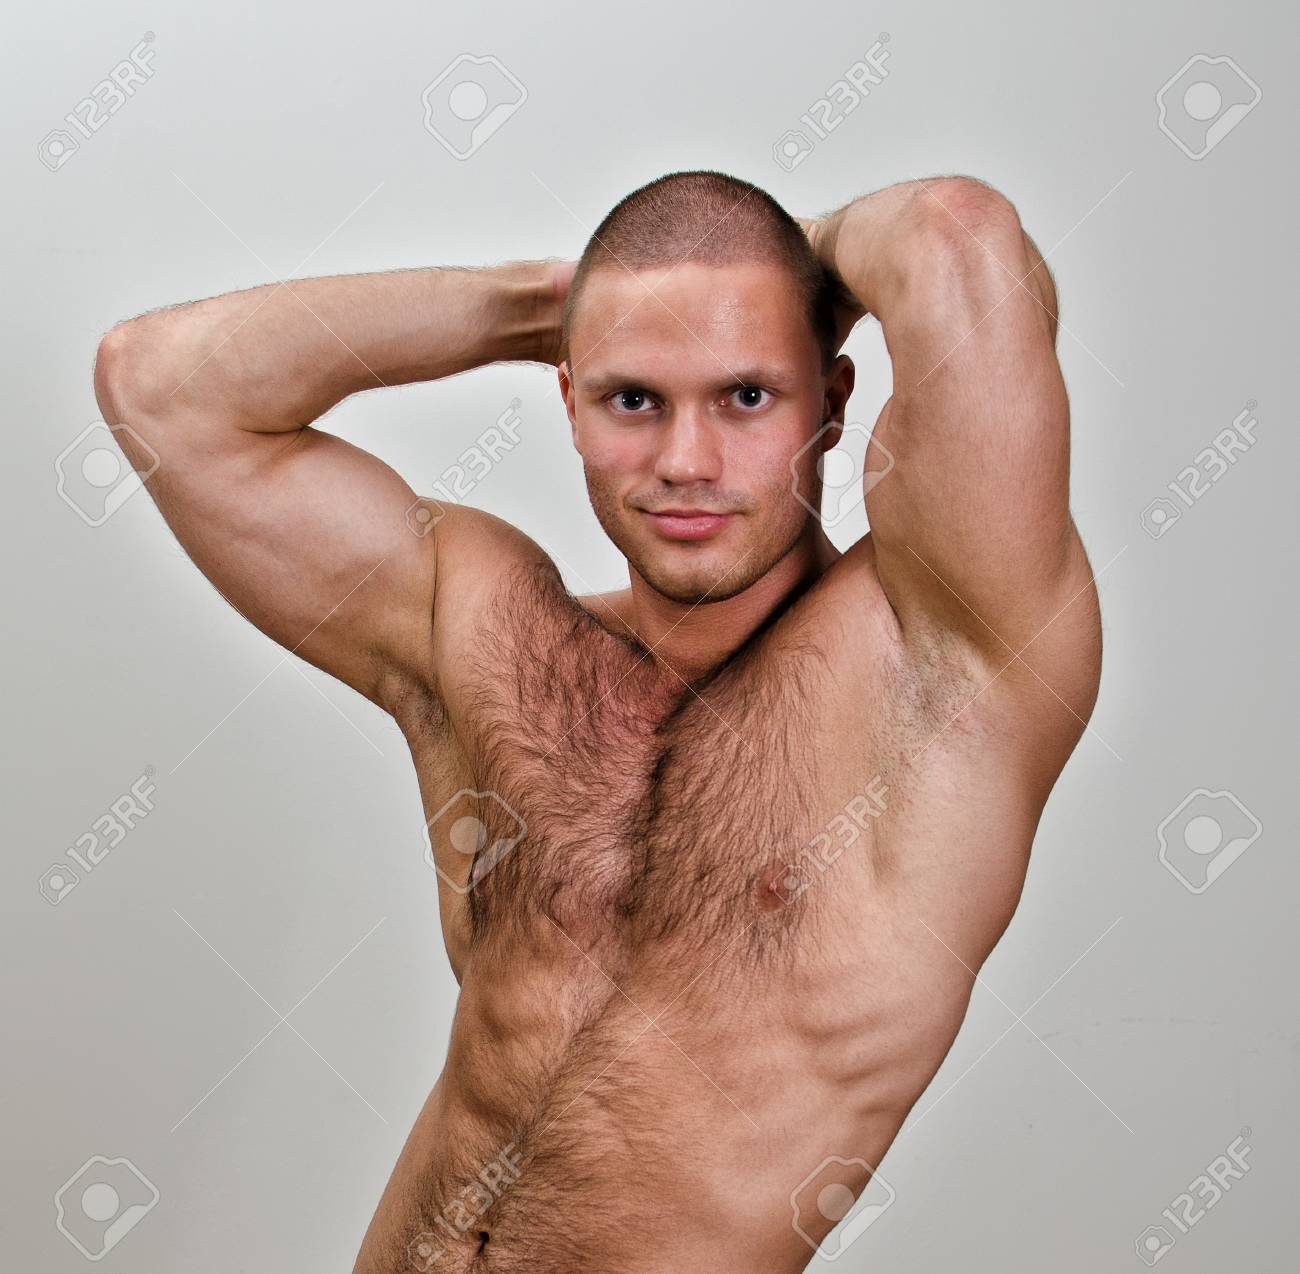 Muscular bodybuilder torso. On grey background. Stock Photo - 14265335